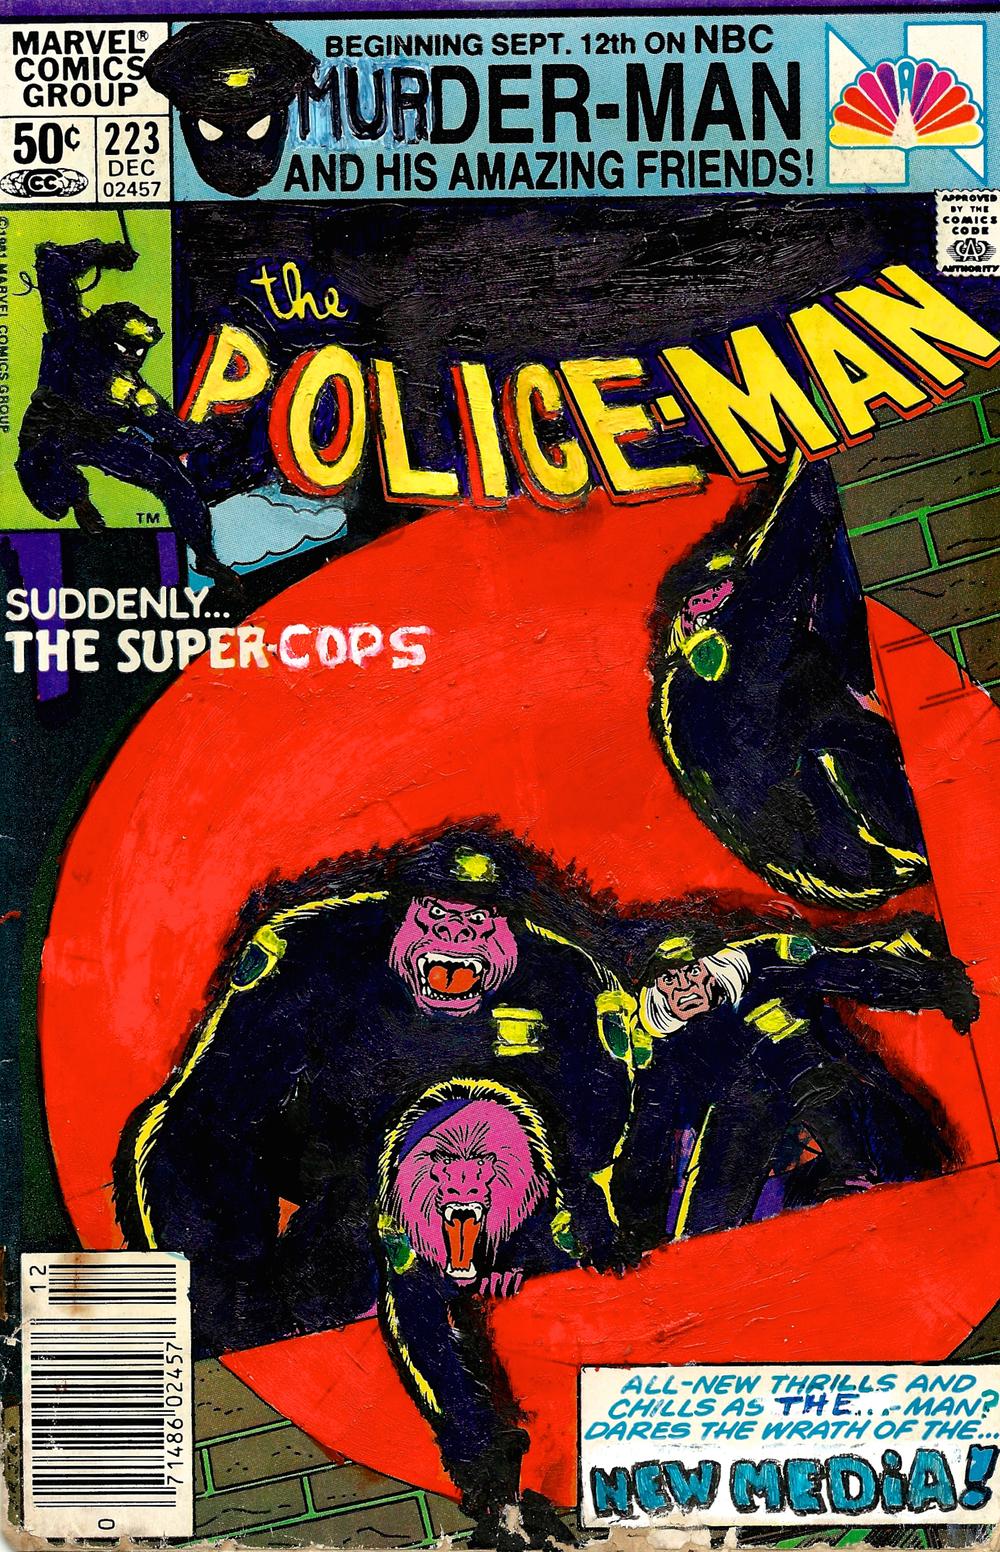 Police-Man  #223